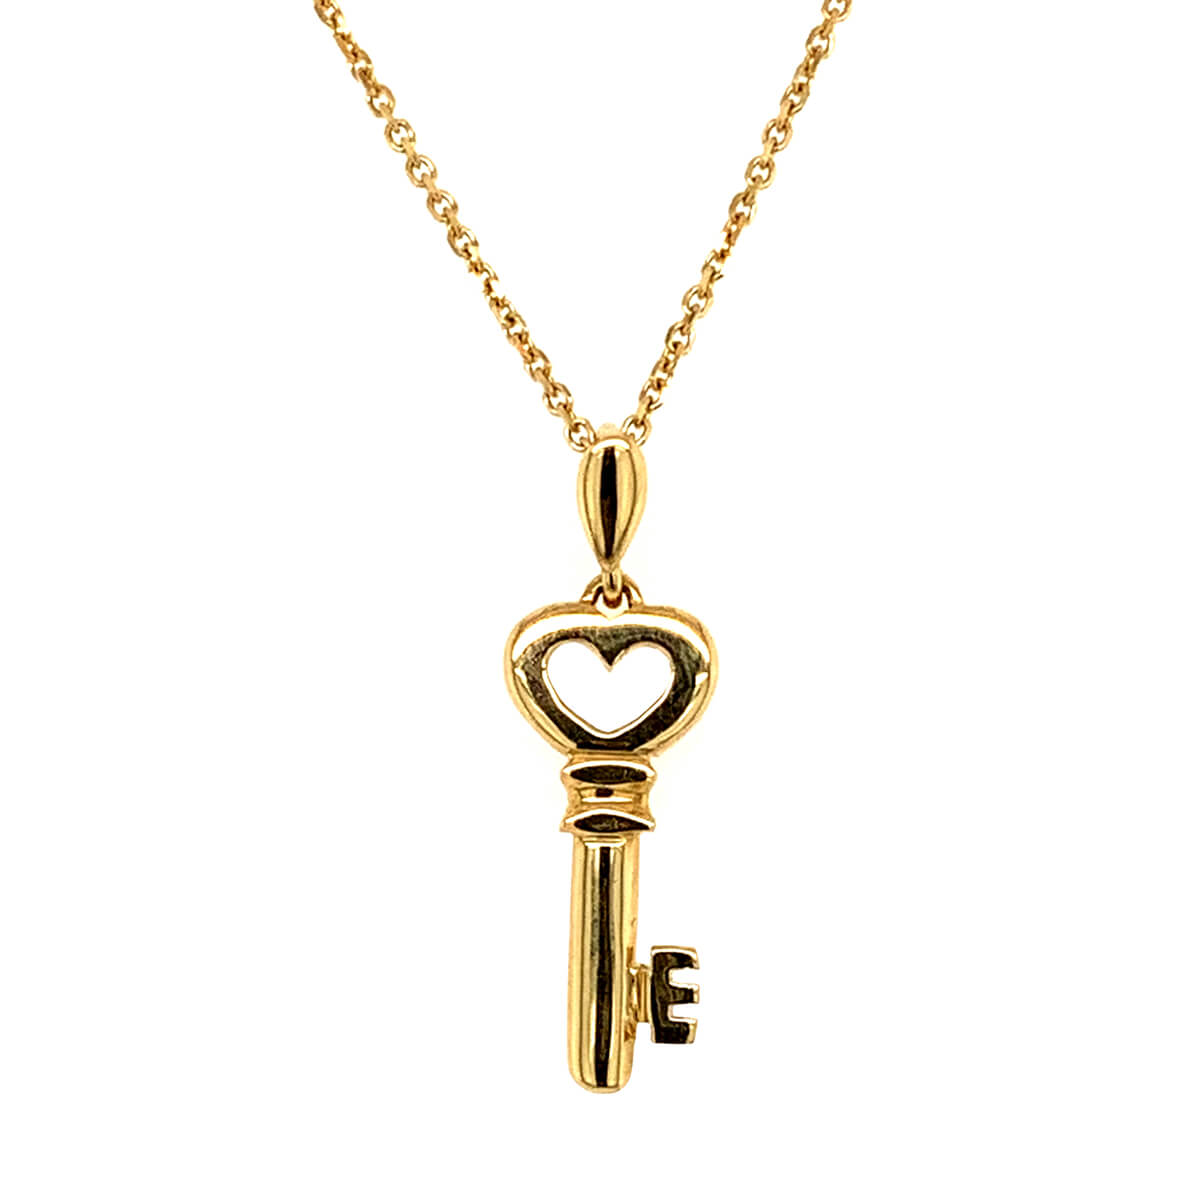 18ct Yellow Gold Key Design Pendant